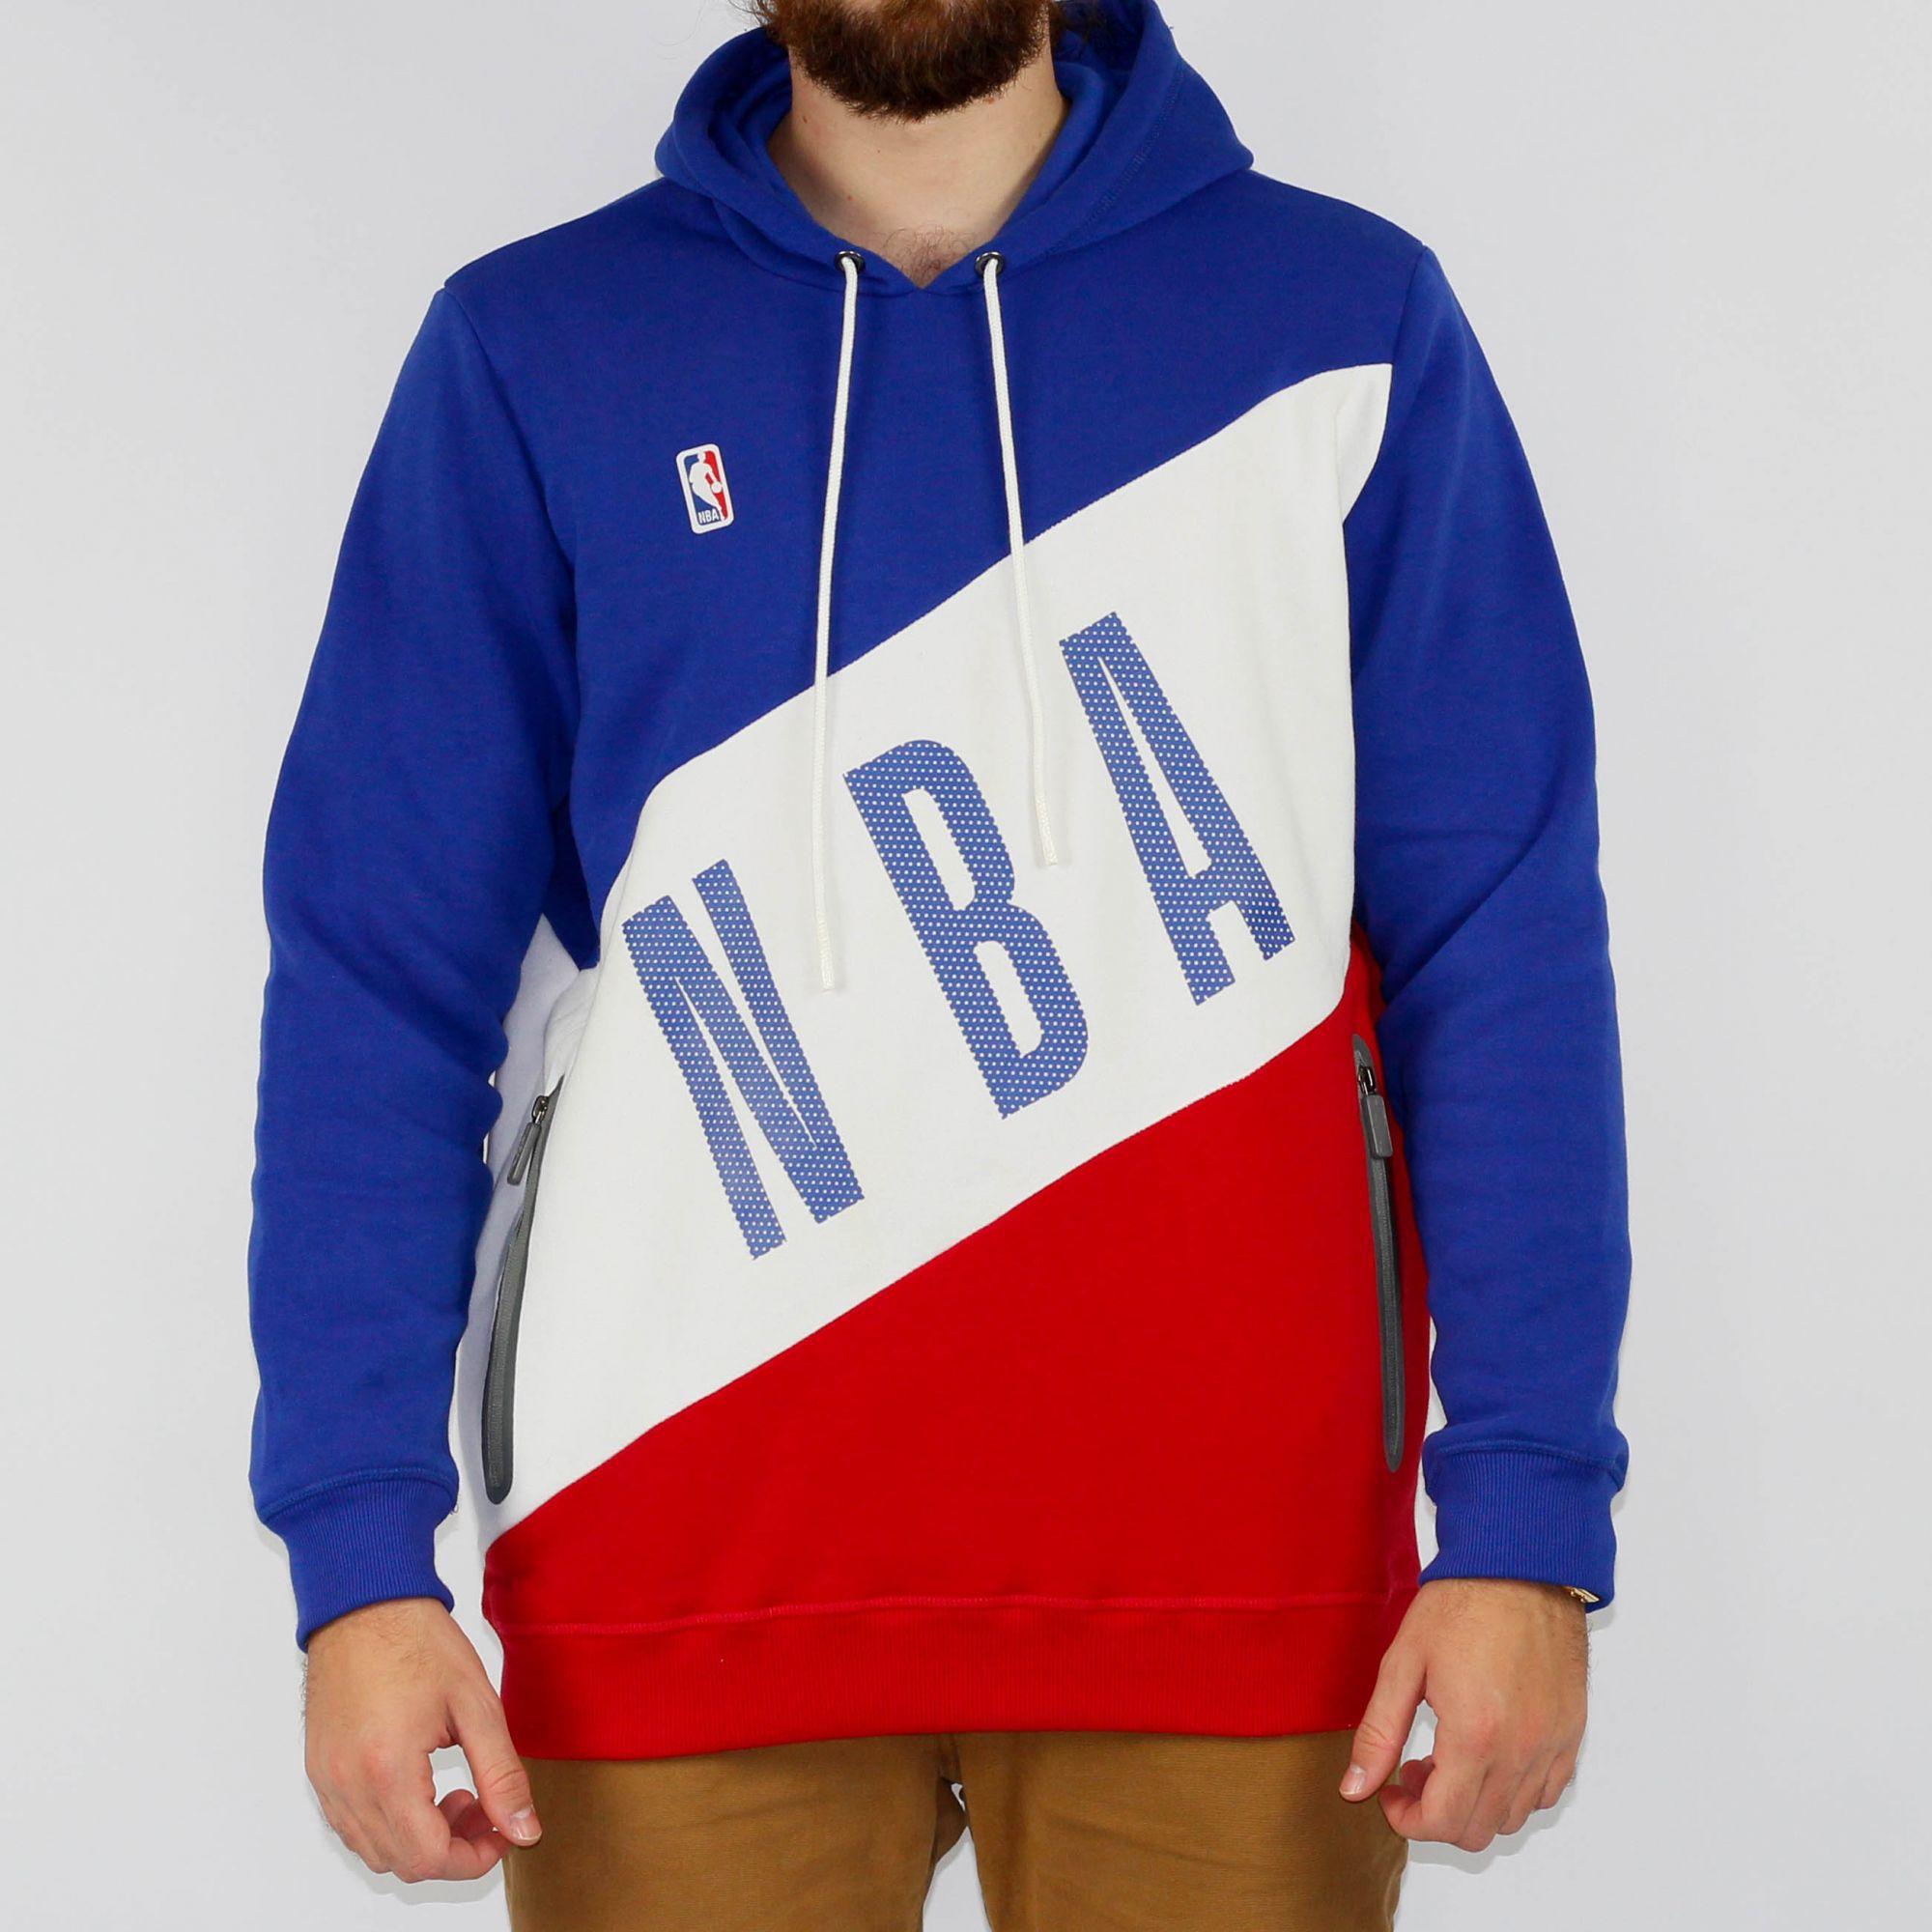 Moletom NBA Azul/Branco/Vermelho